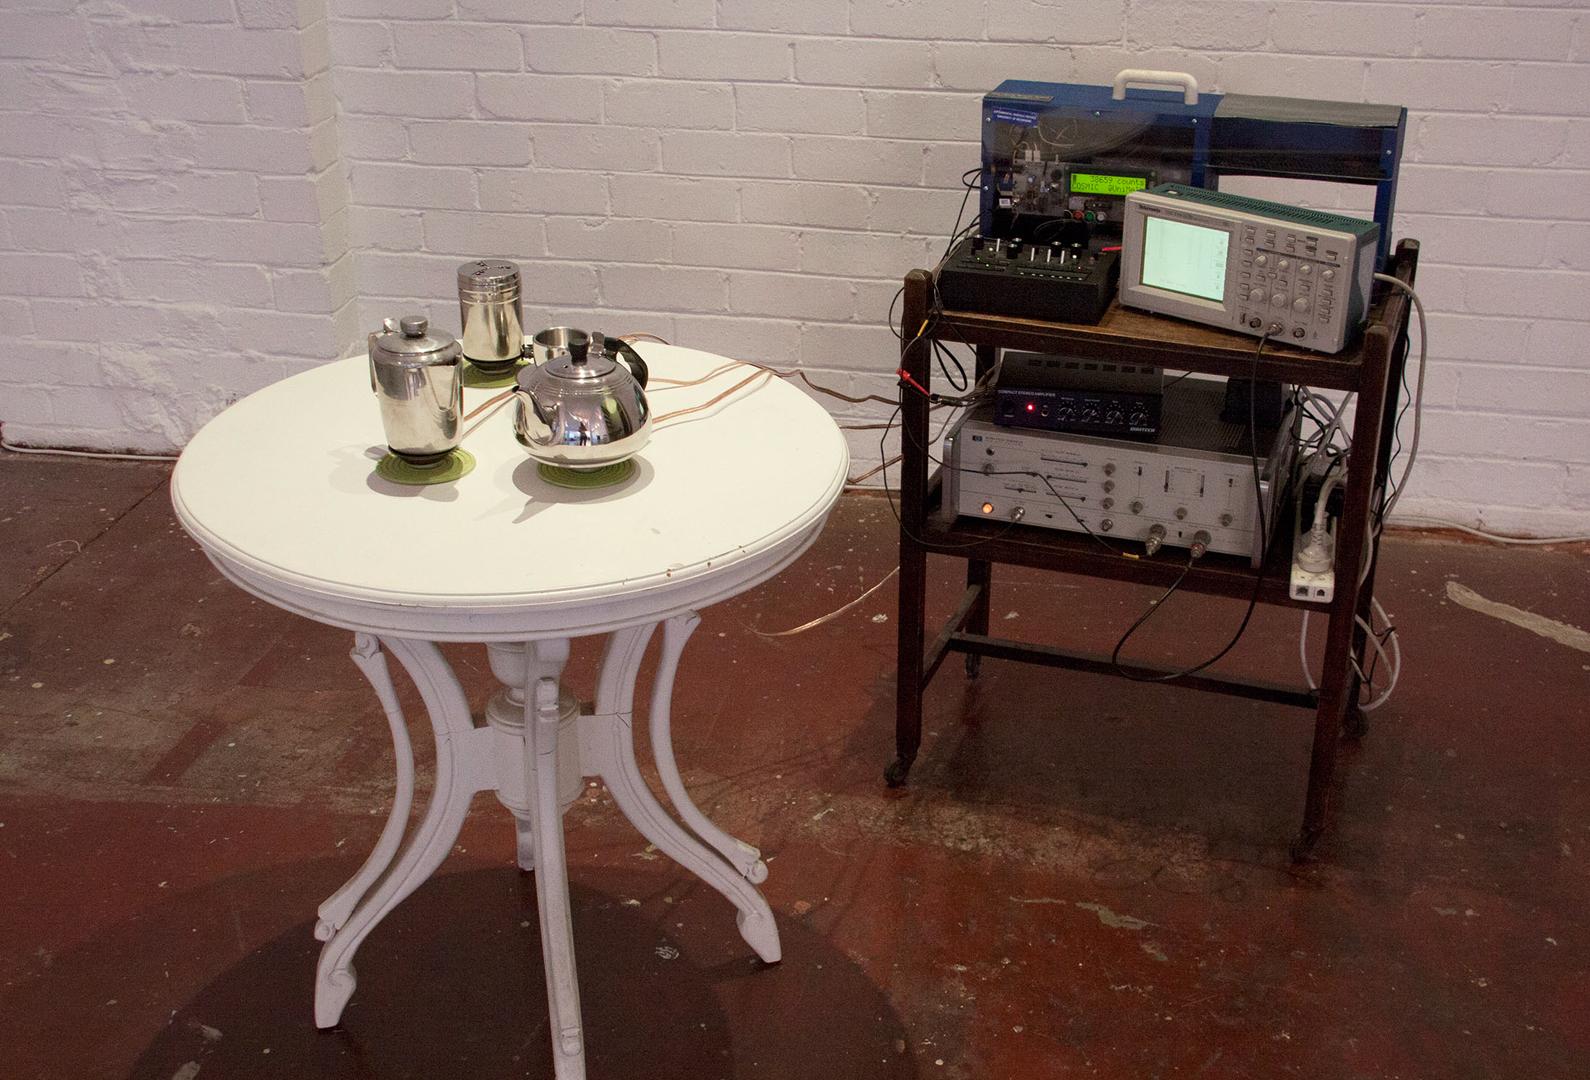 ©ISEA2016: 22nd International Symposium on Electronic Art, Chris Henschke, Cosmic Tea Party